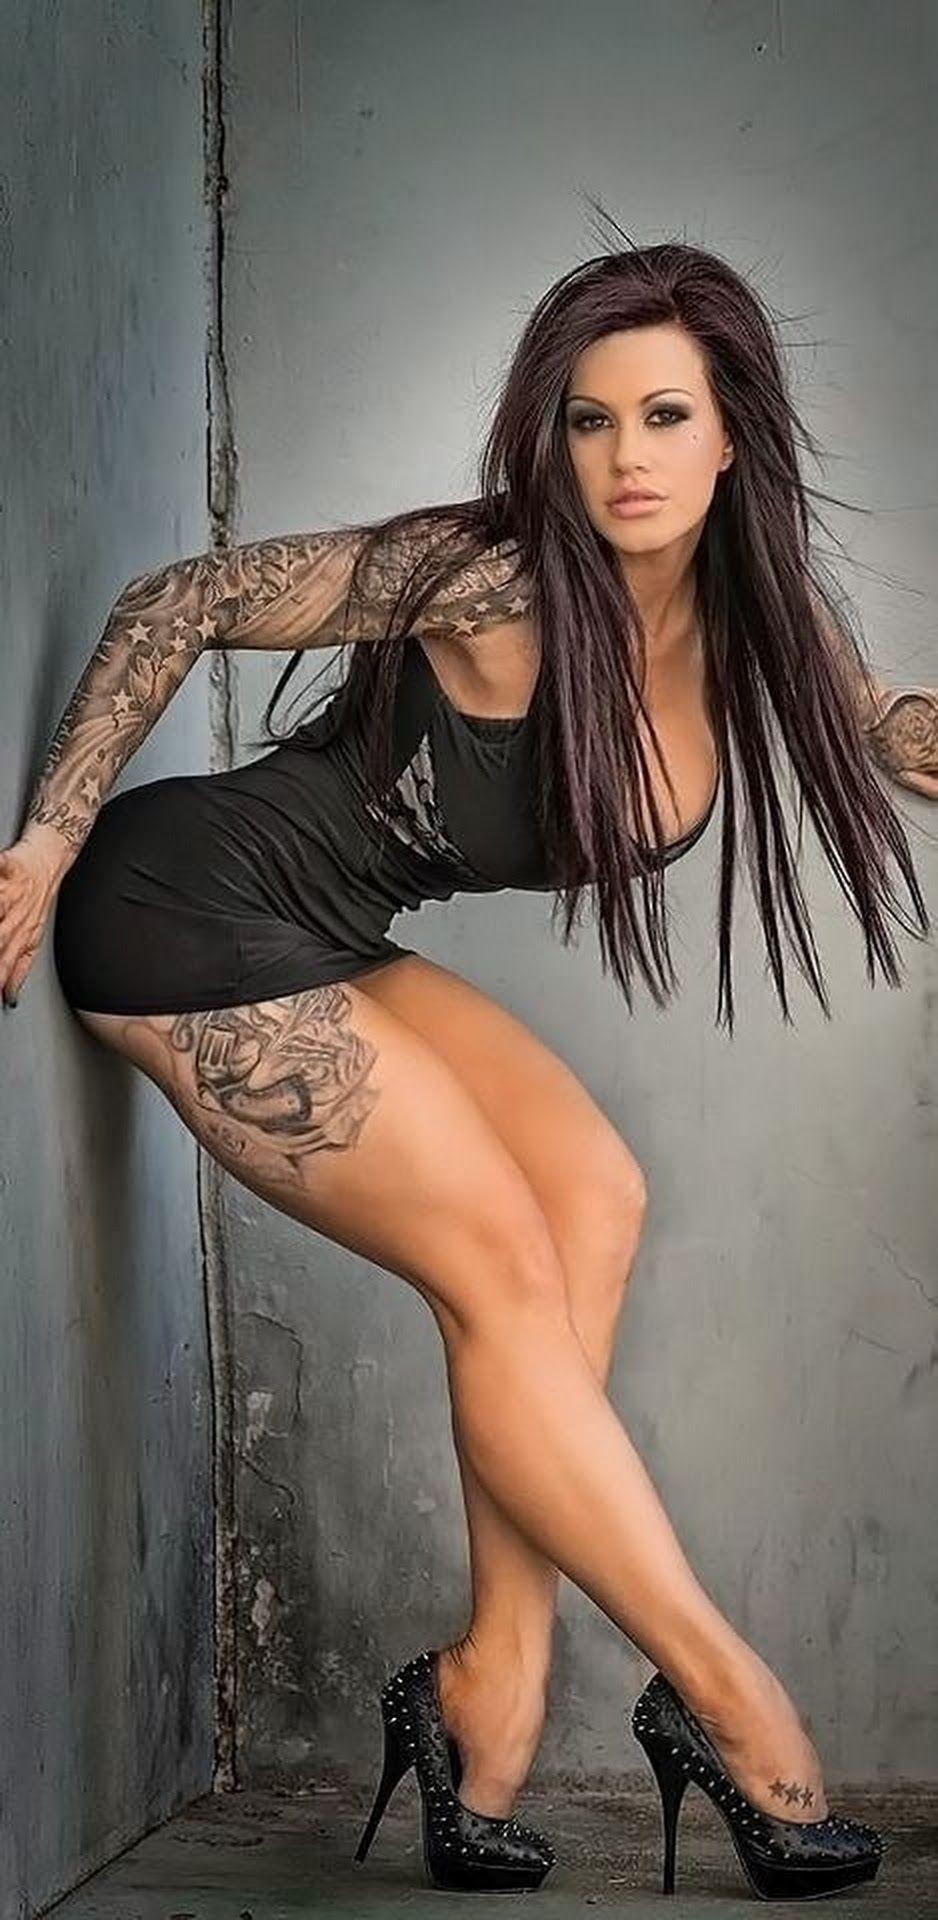 Hope, Model heather moss nude tattoo you the